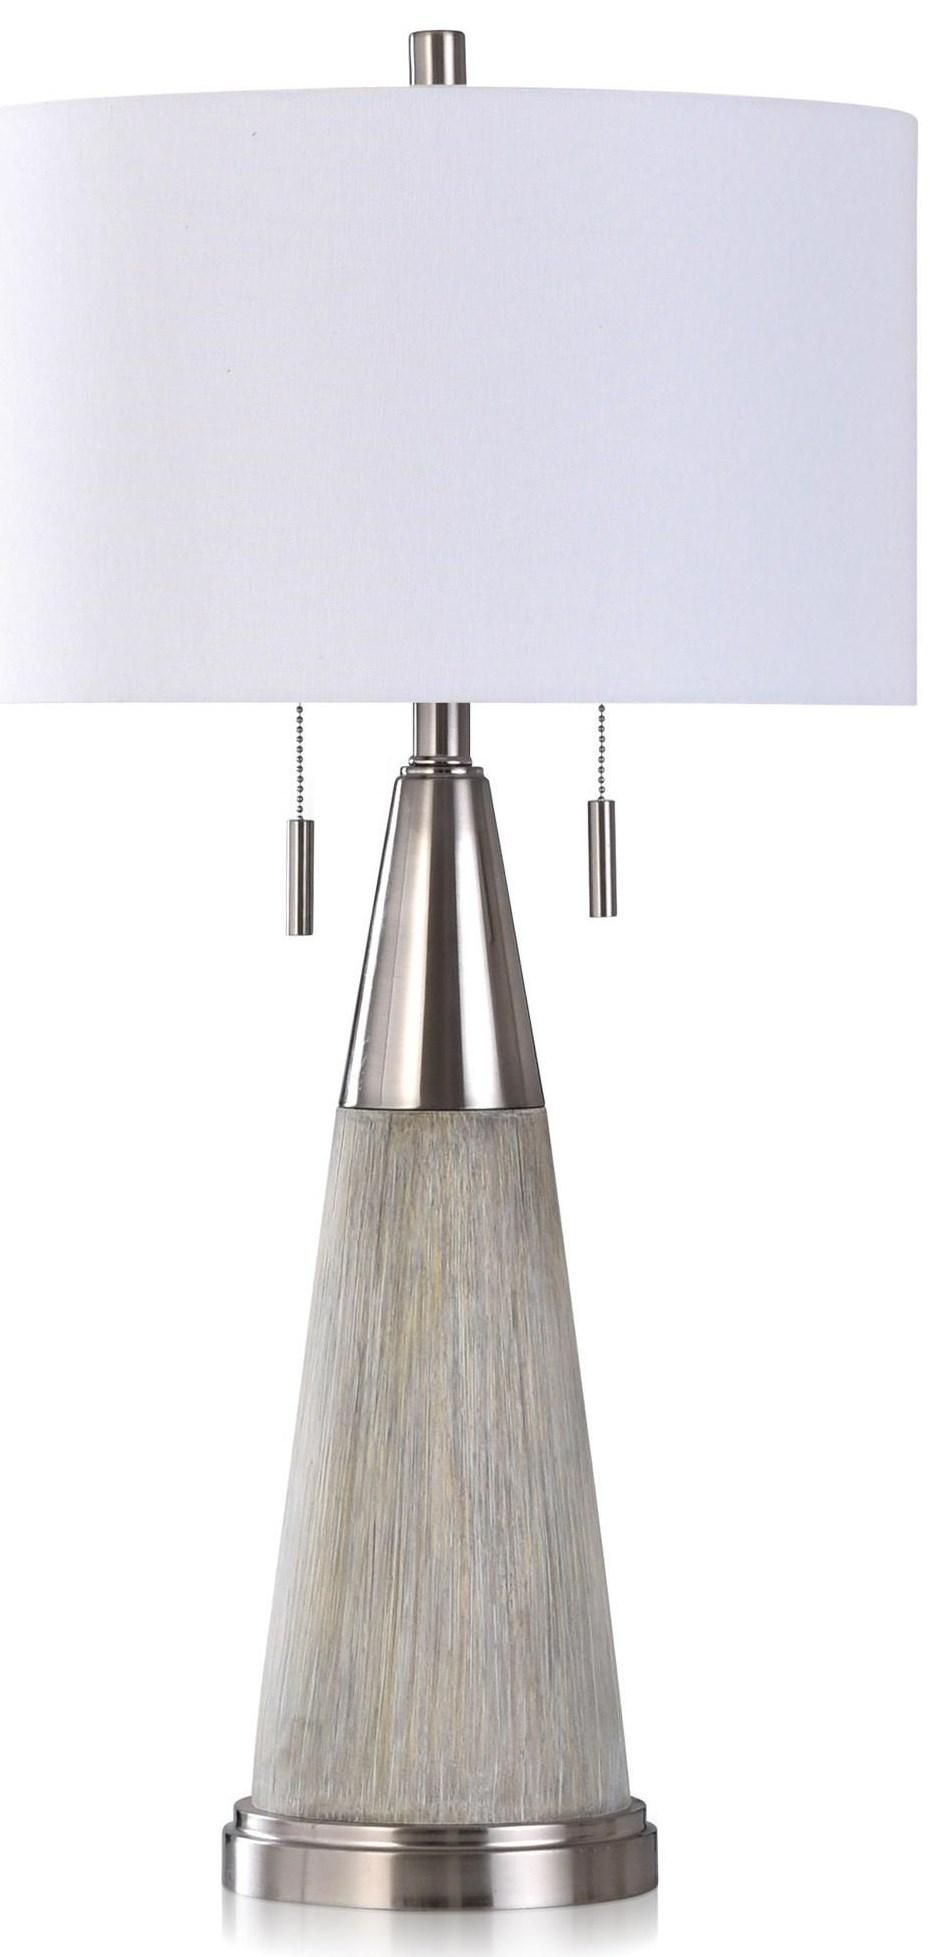 Lamps CIGLAR SILVER LAMP by StyleCraft at Furniture Fair - North Carolina